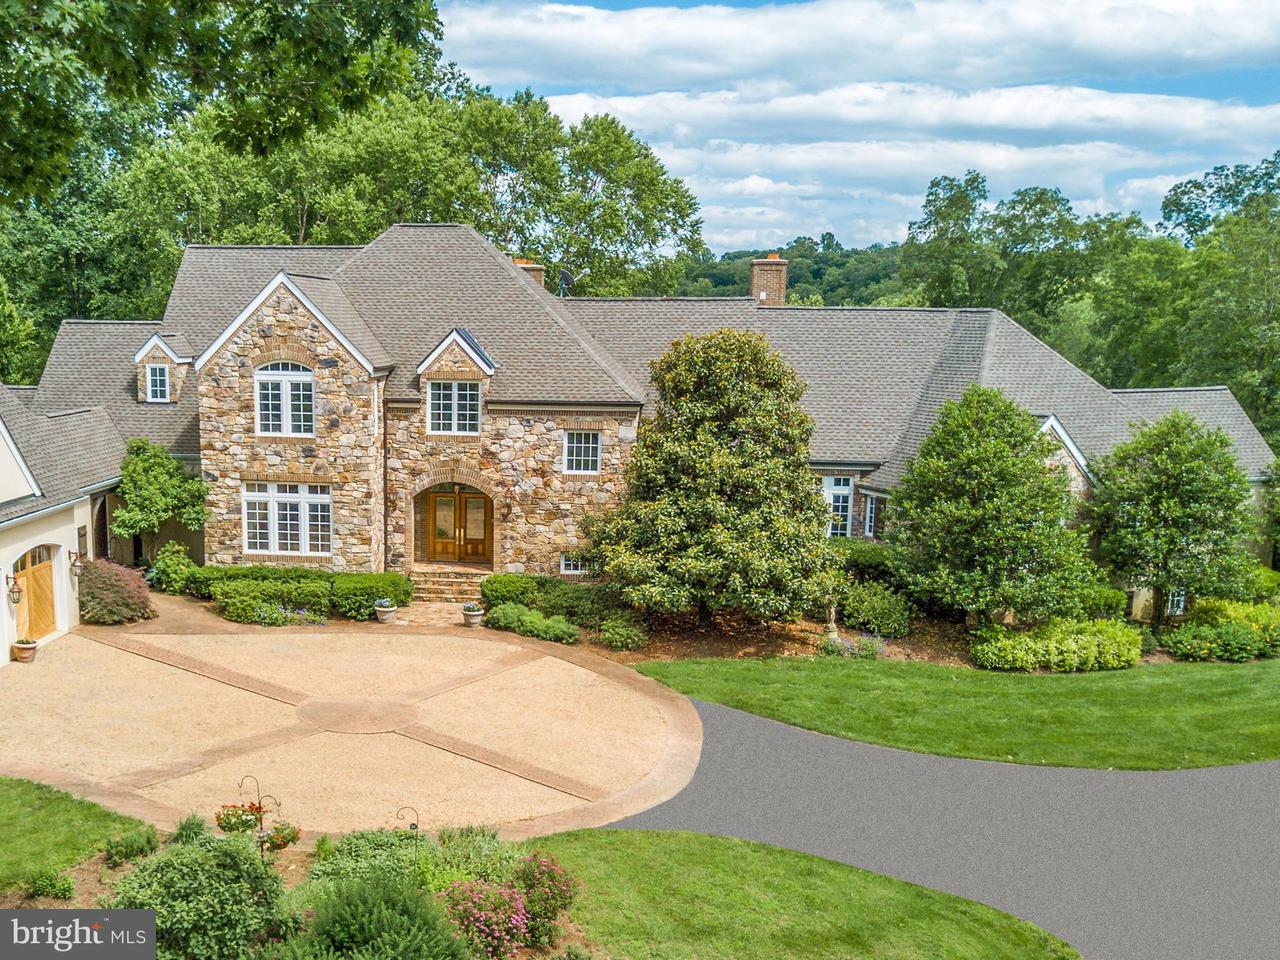 獨棟家庭住宅 為 出售 在 1679 N Poes Road 1679 N Poes Road Flint Hill, 弗吉尼亞州 22627 美國